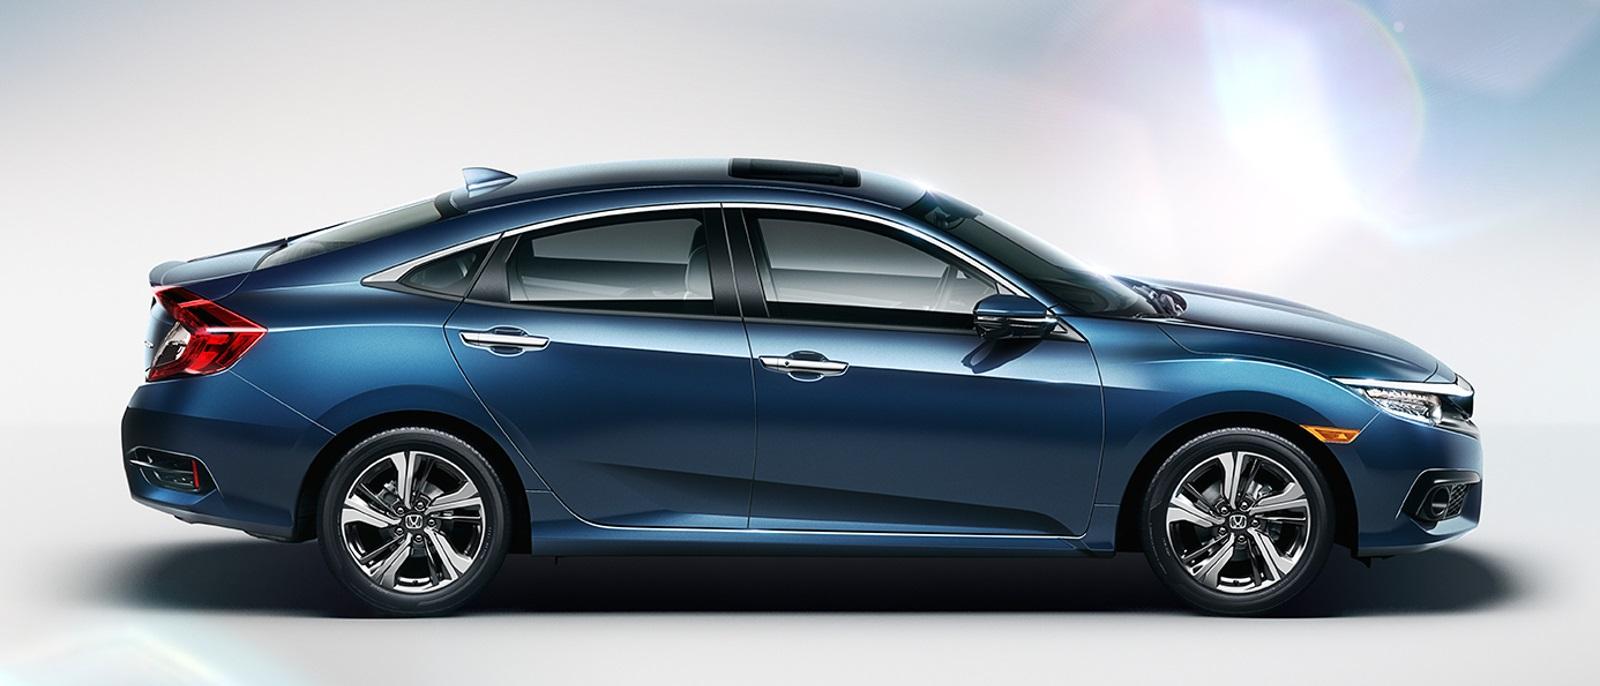 2016 Honda Civic Full Side View